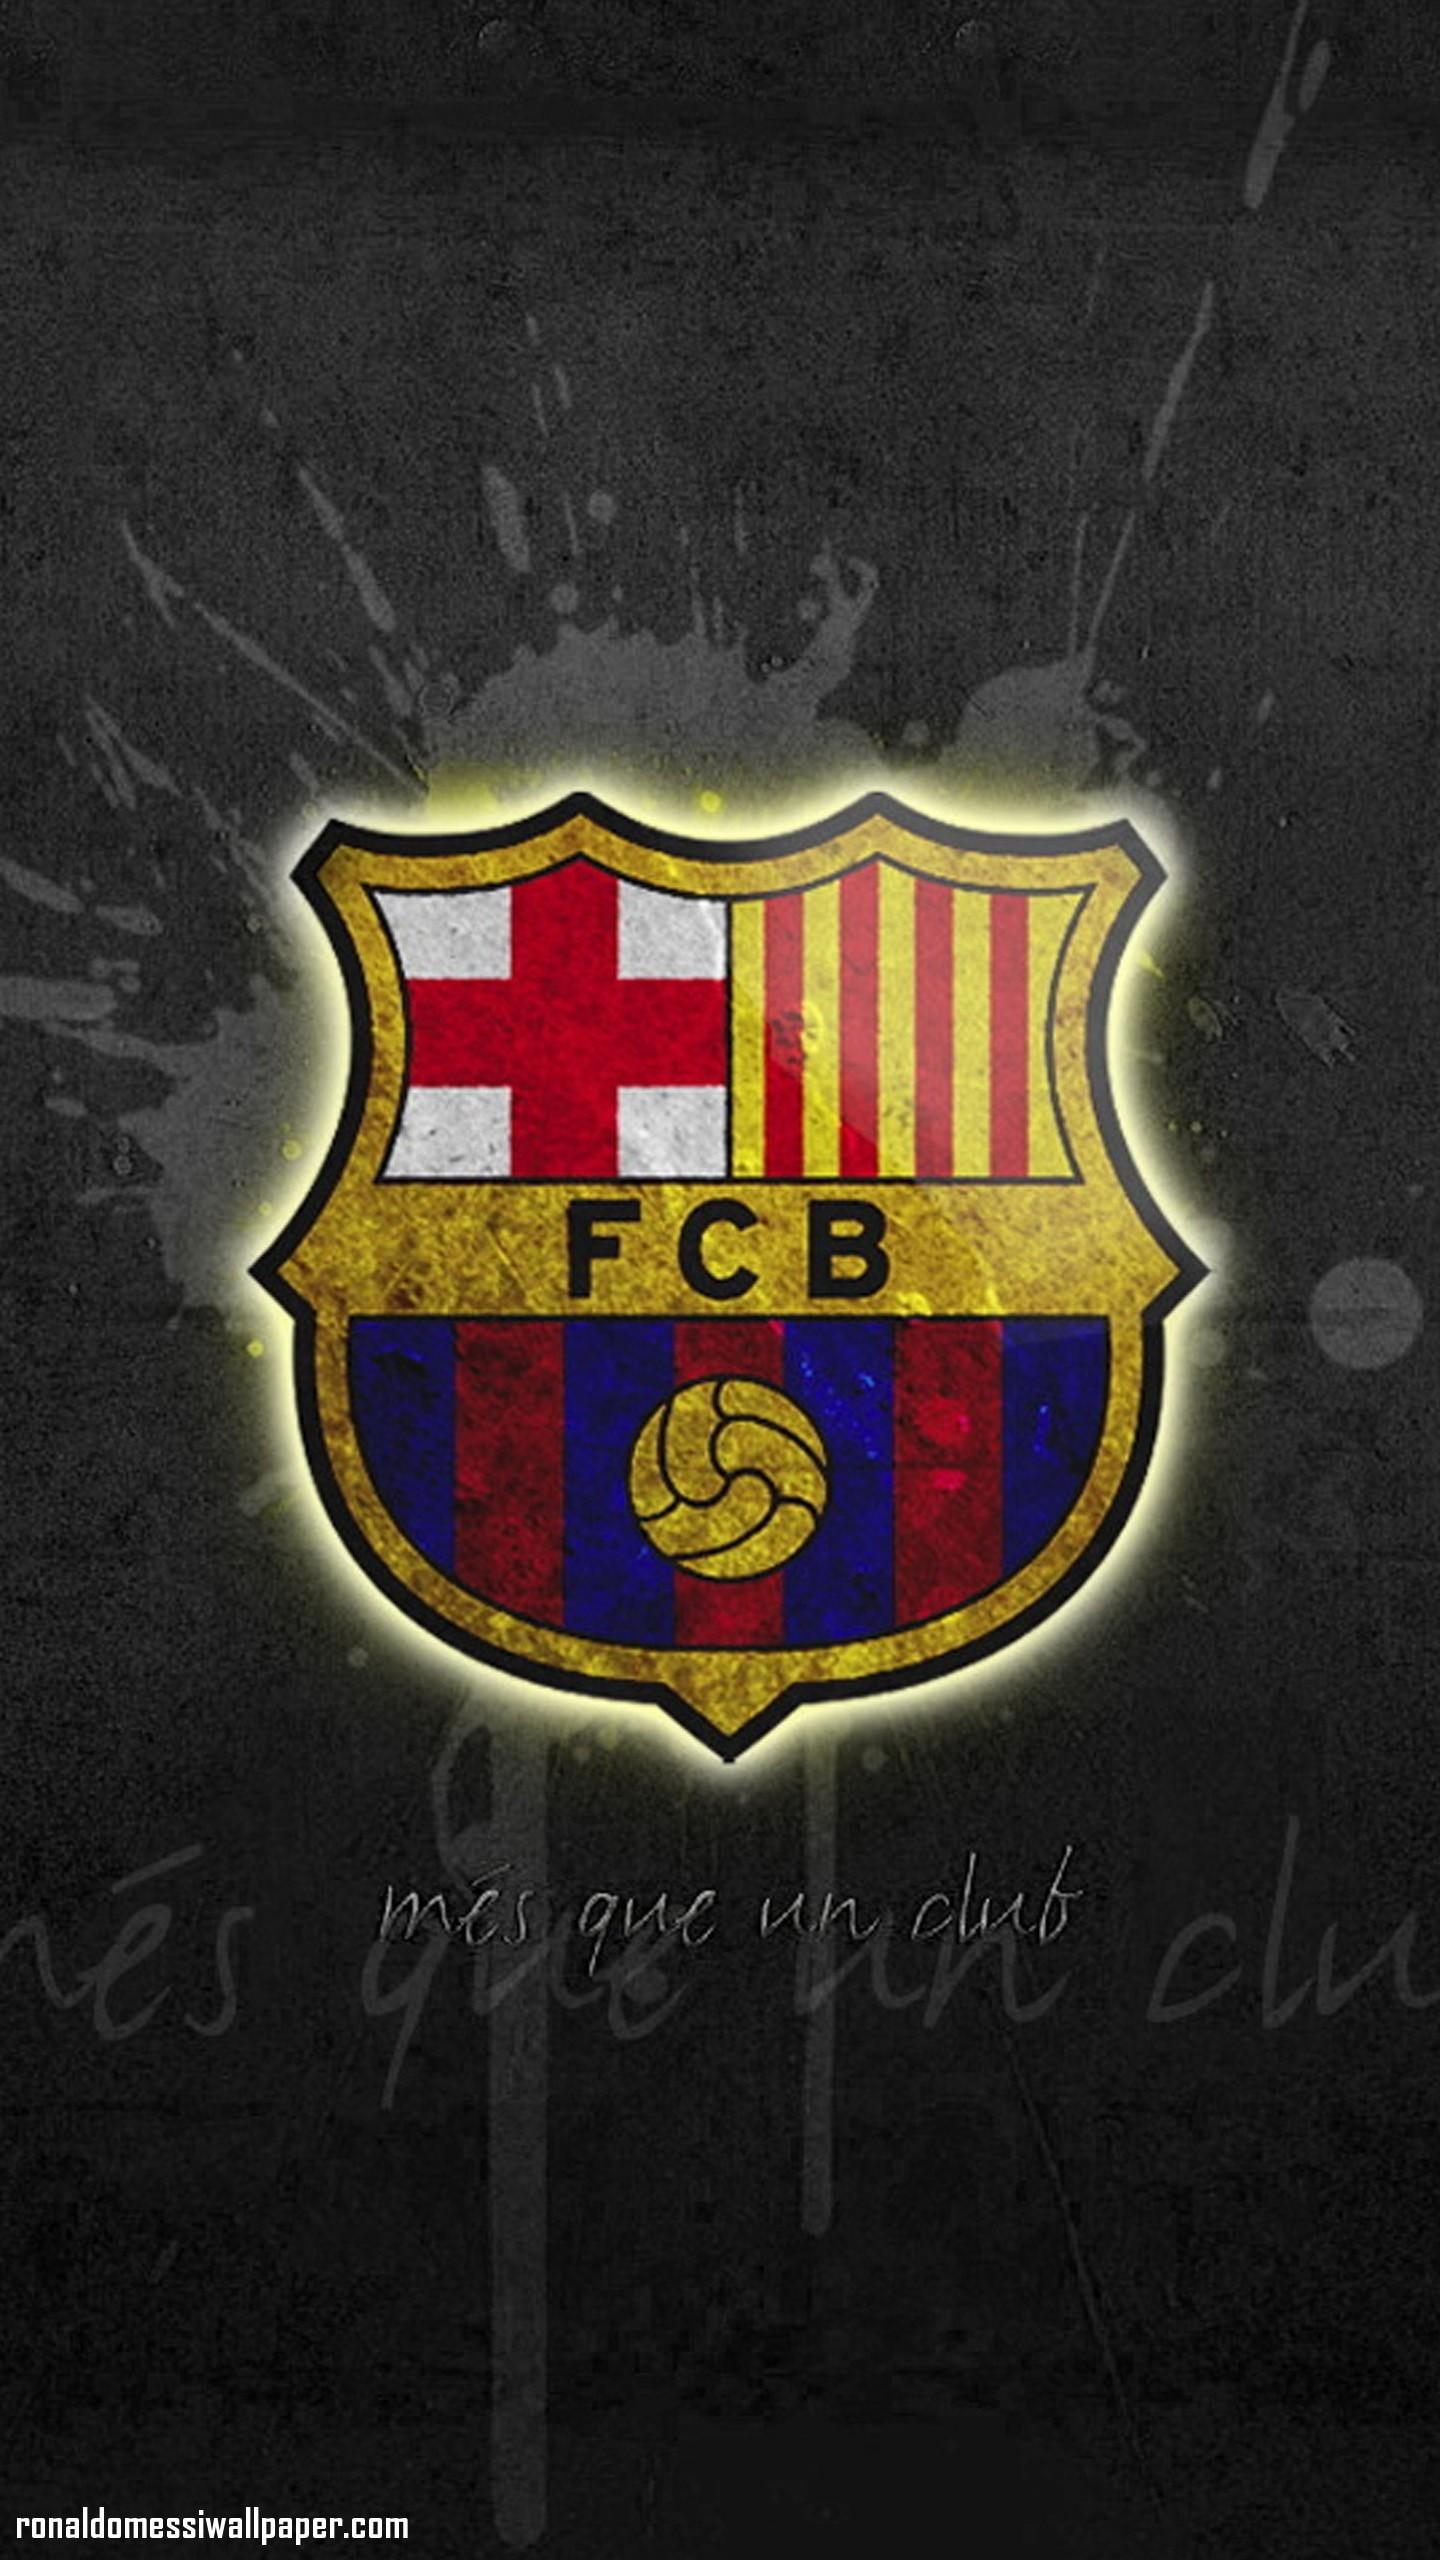 Great Fc Barcelona Live Wallpaper for iPhone Jdy7 Fc Barcelona